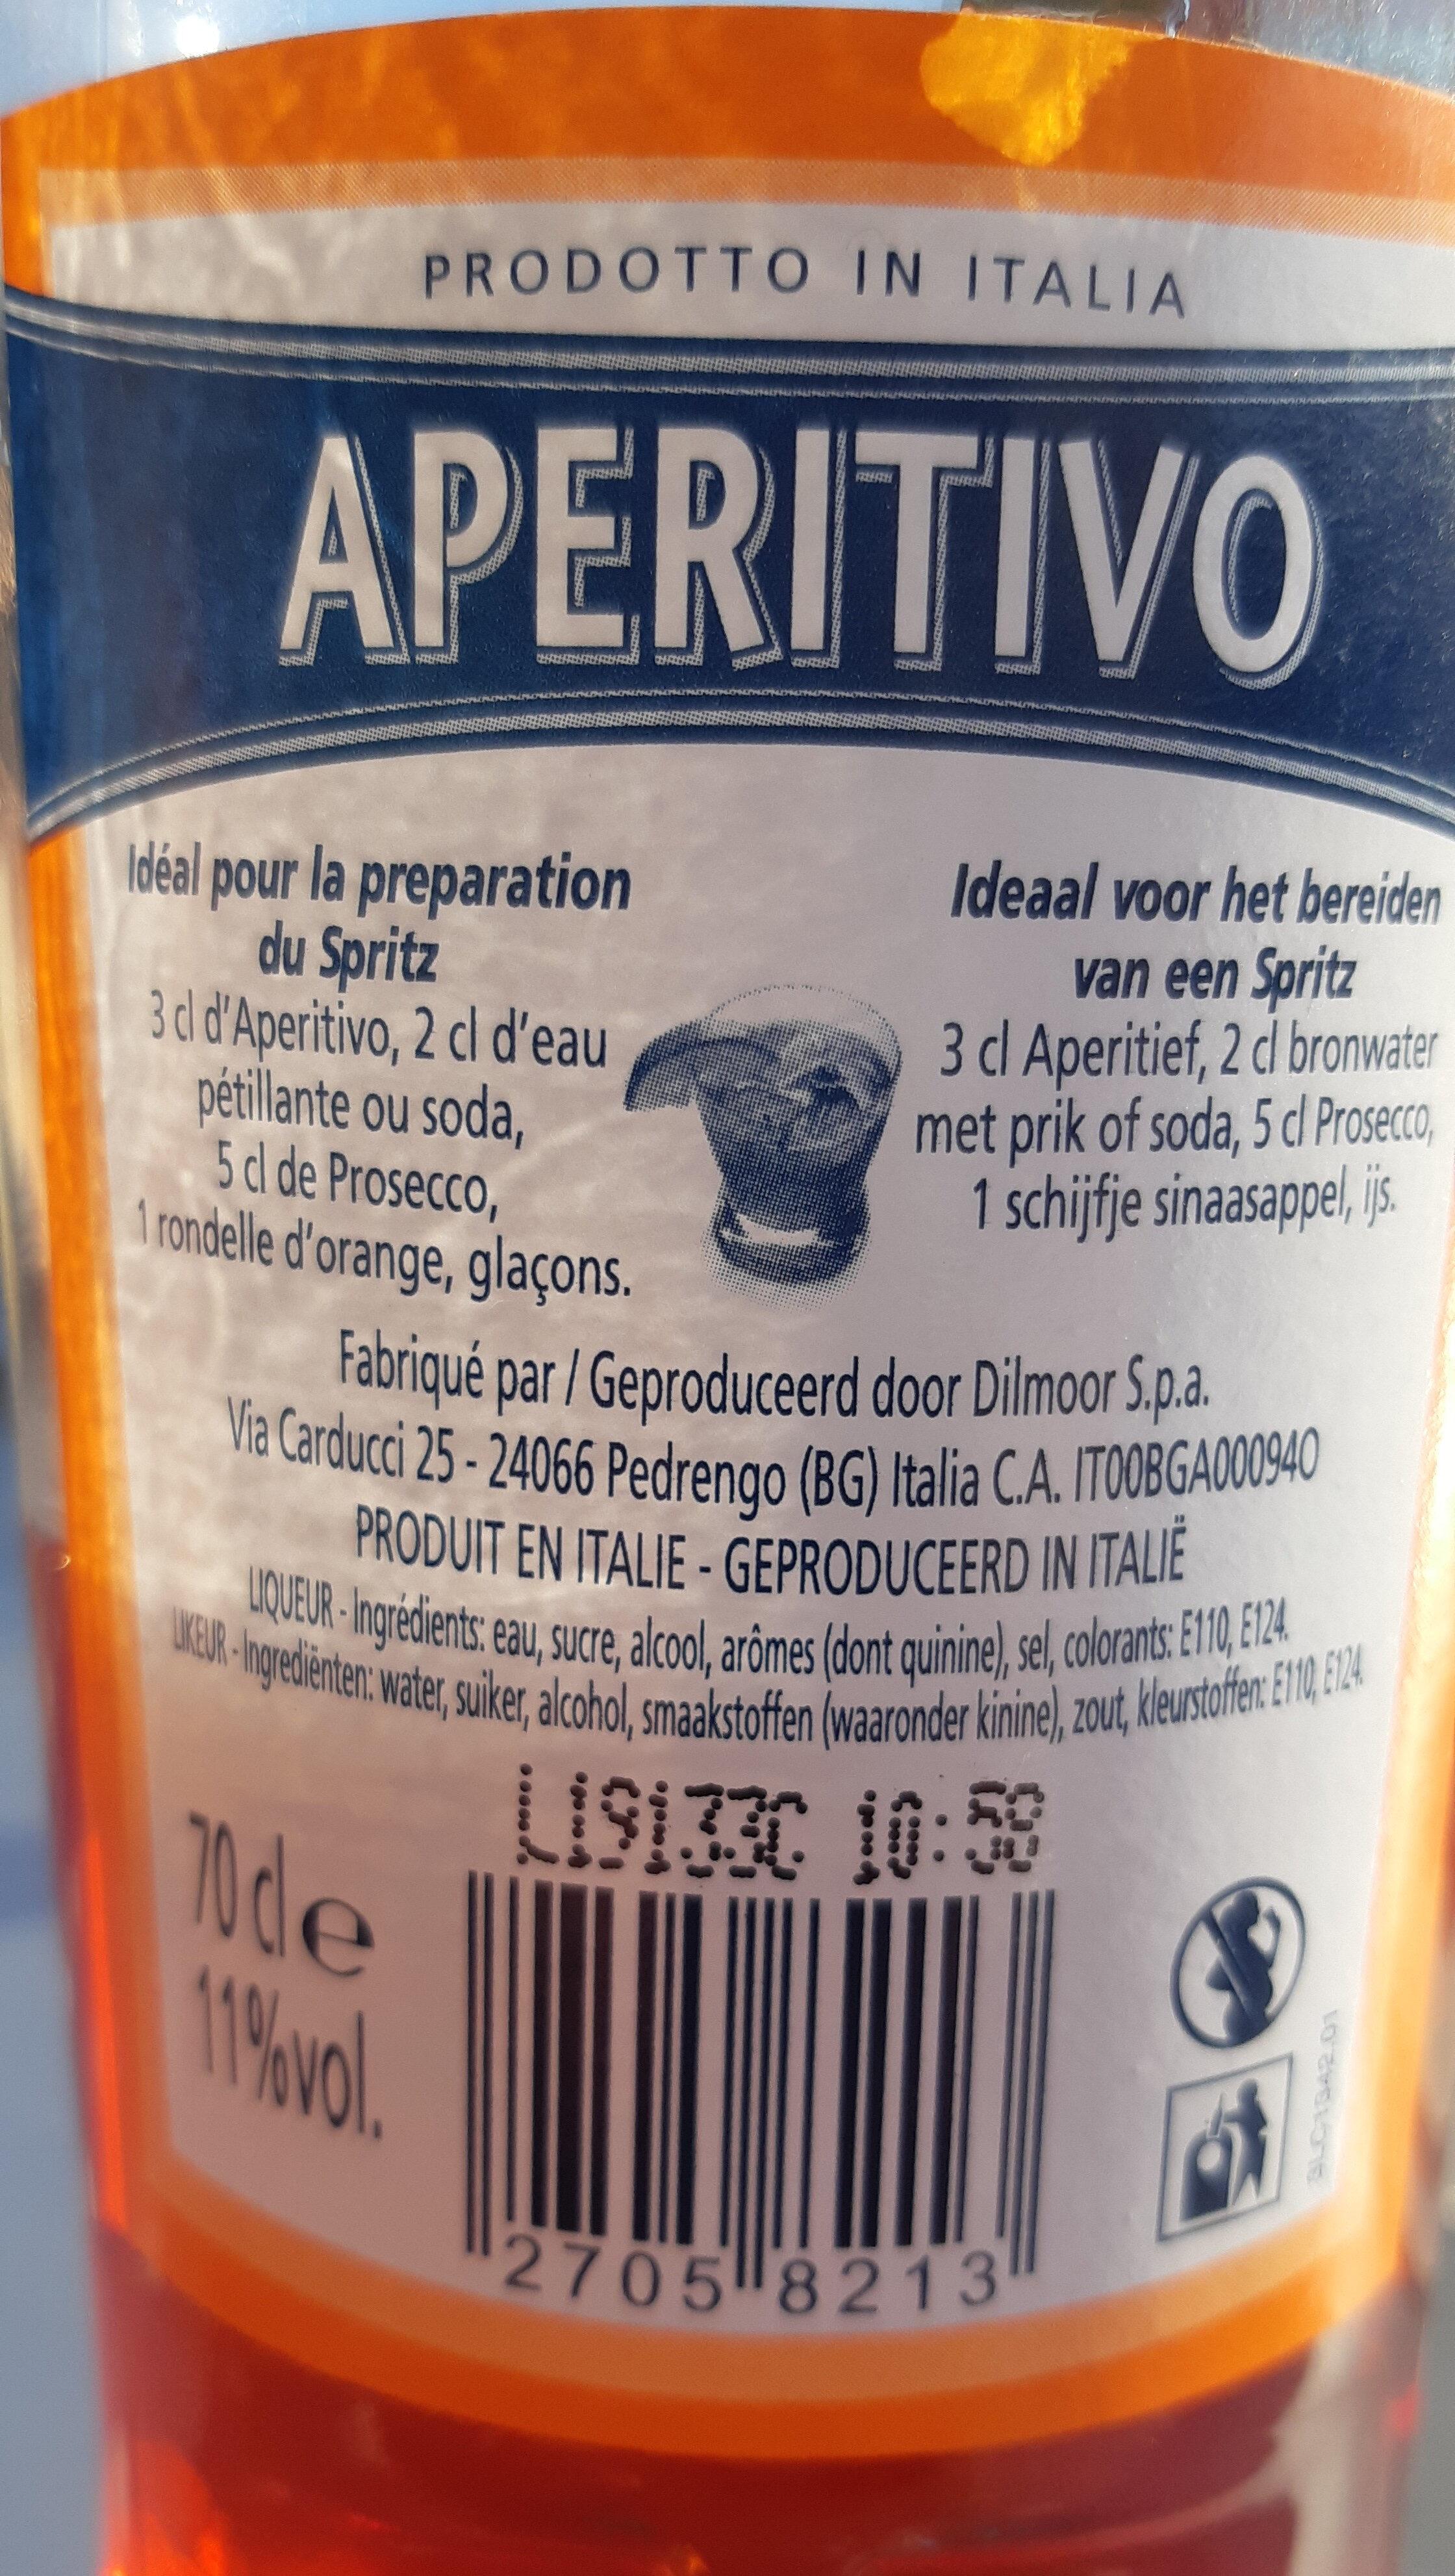 APERITIVO - Product